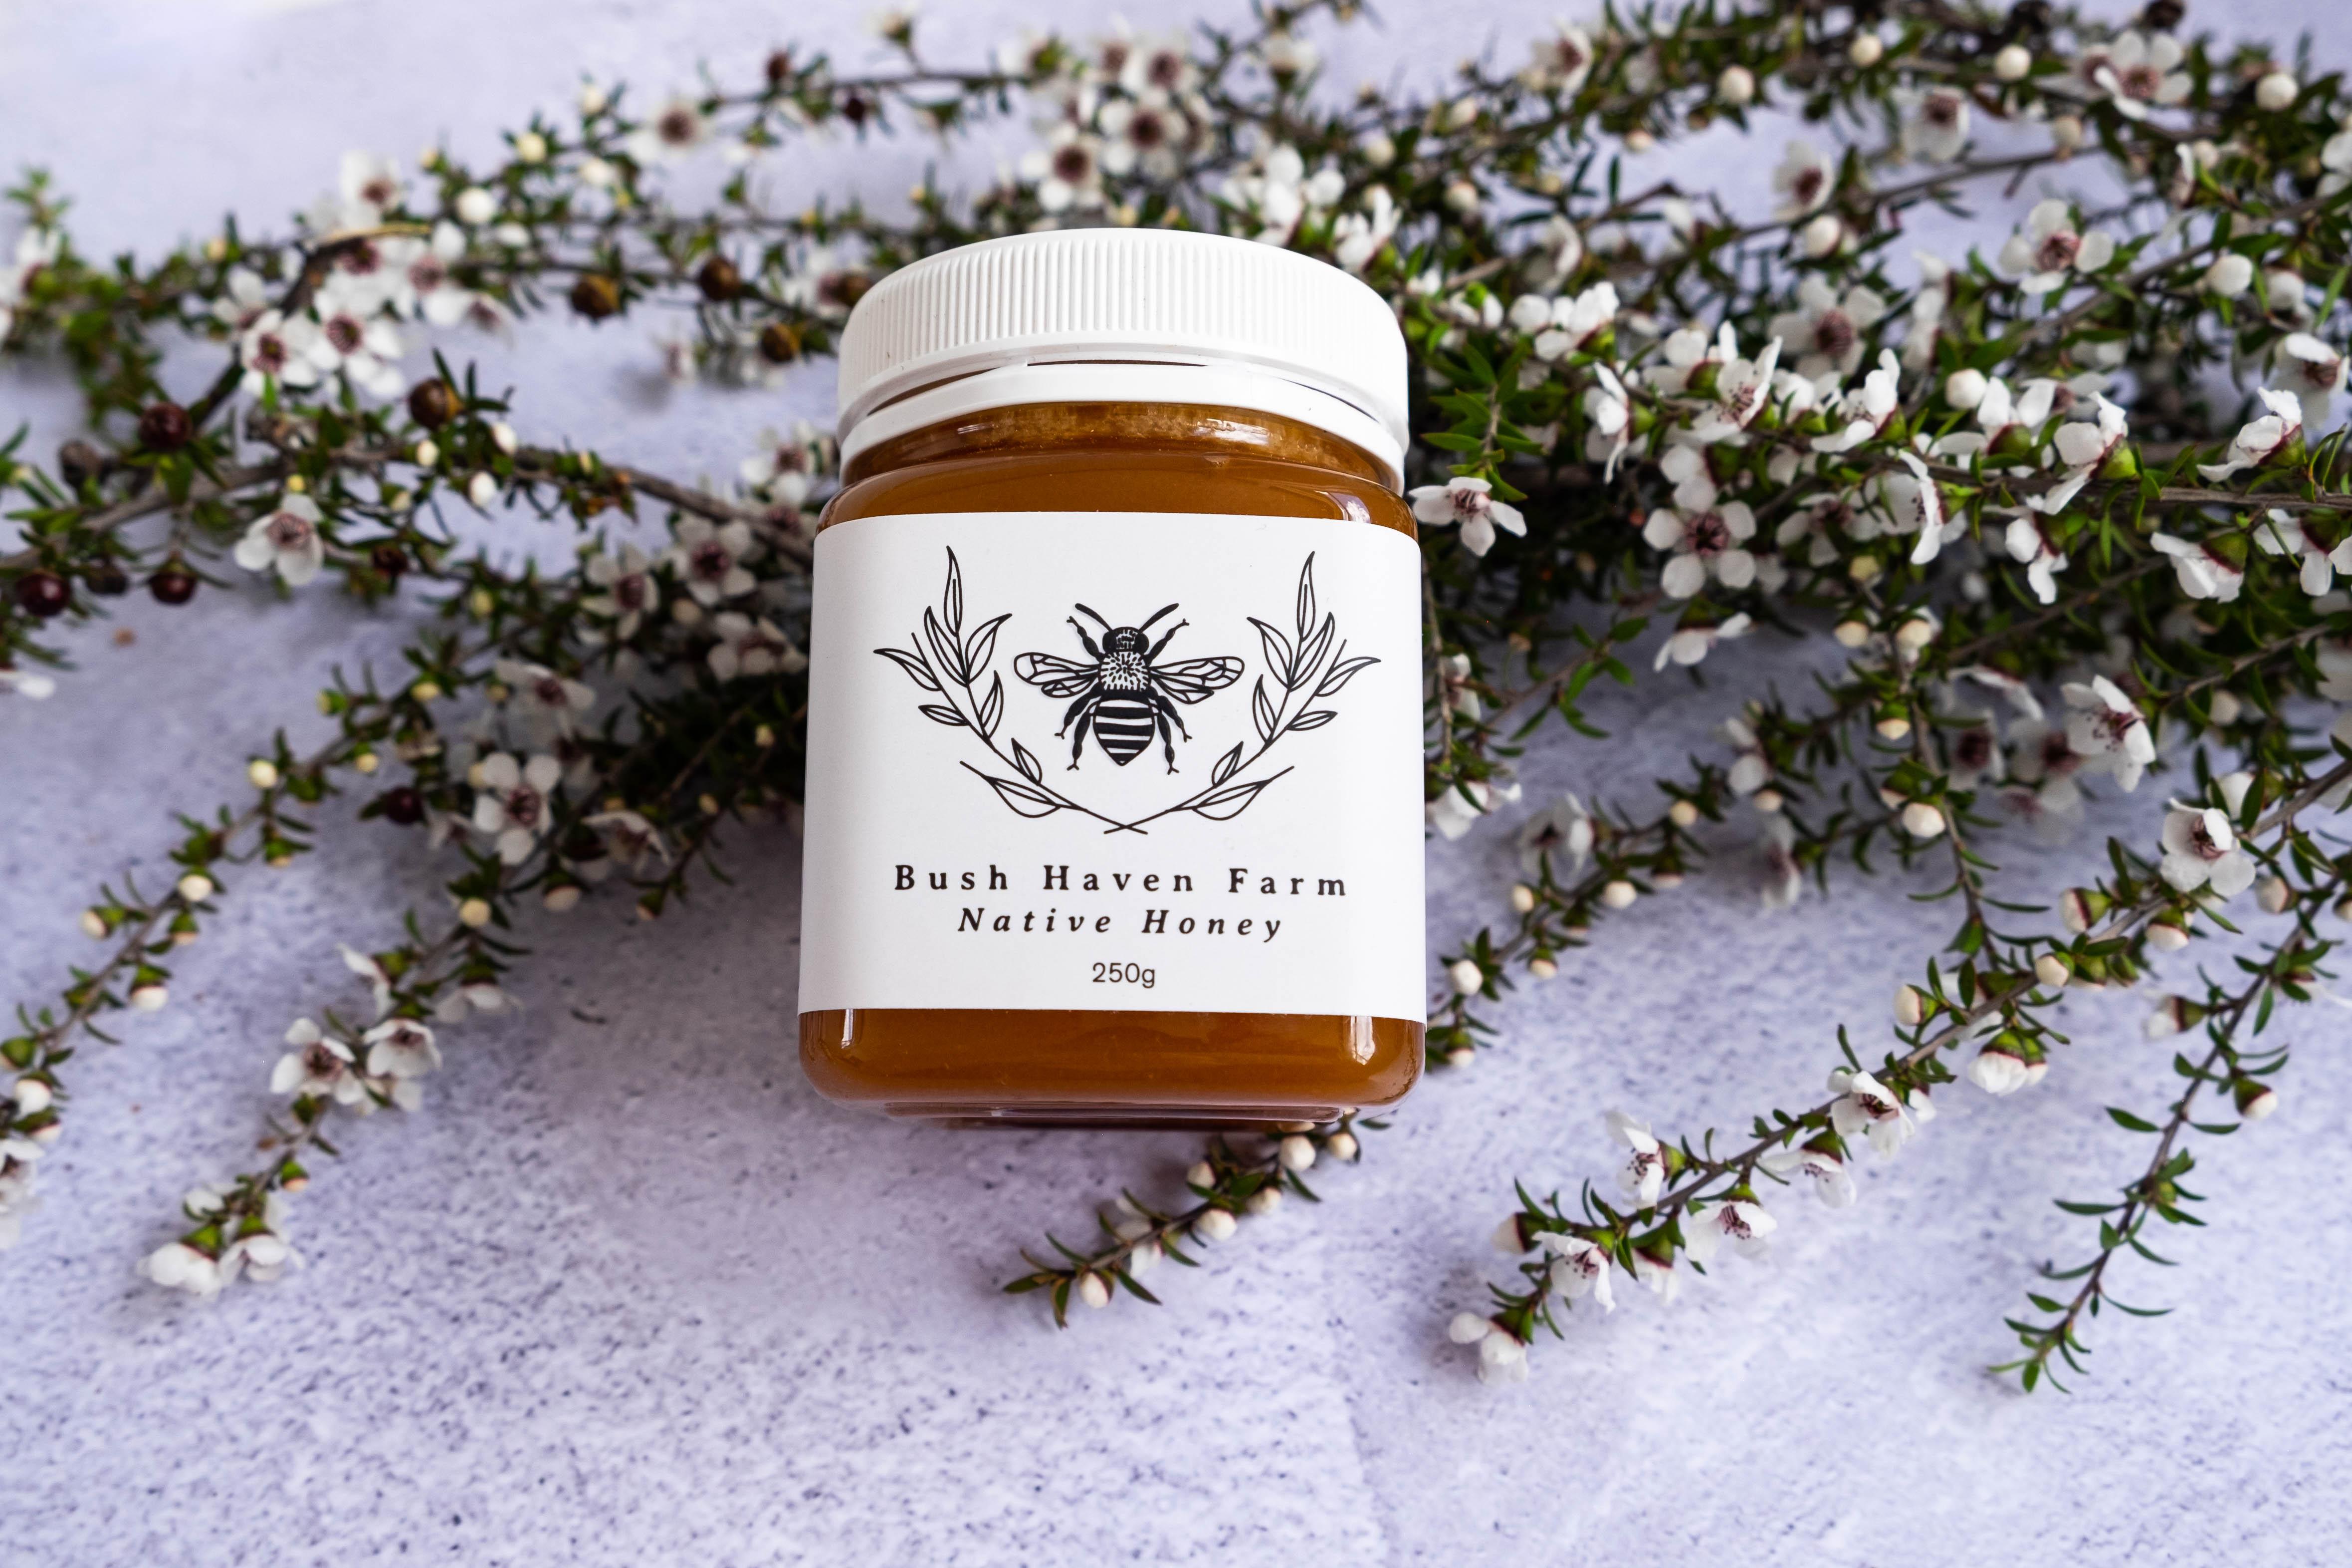 Bush Haven Farm Honey